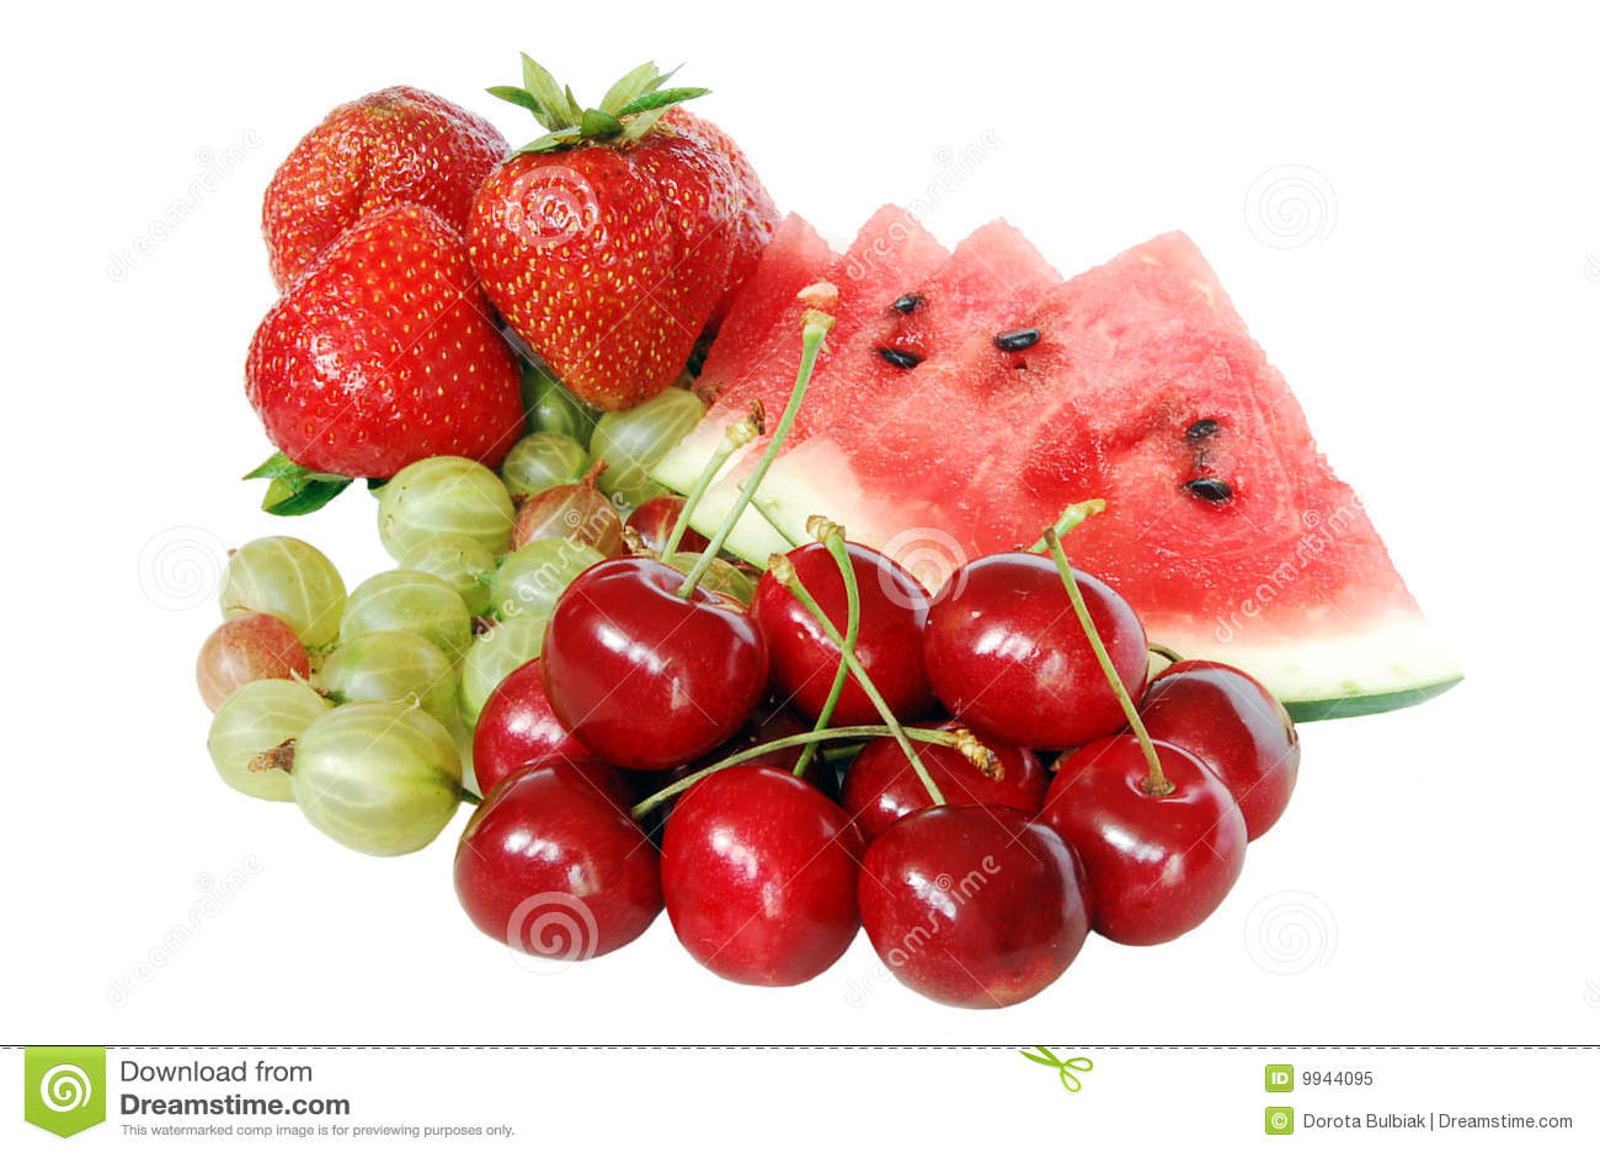 Mix of summer fruits